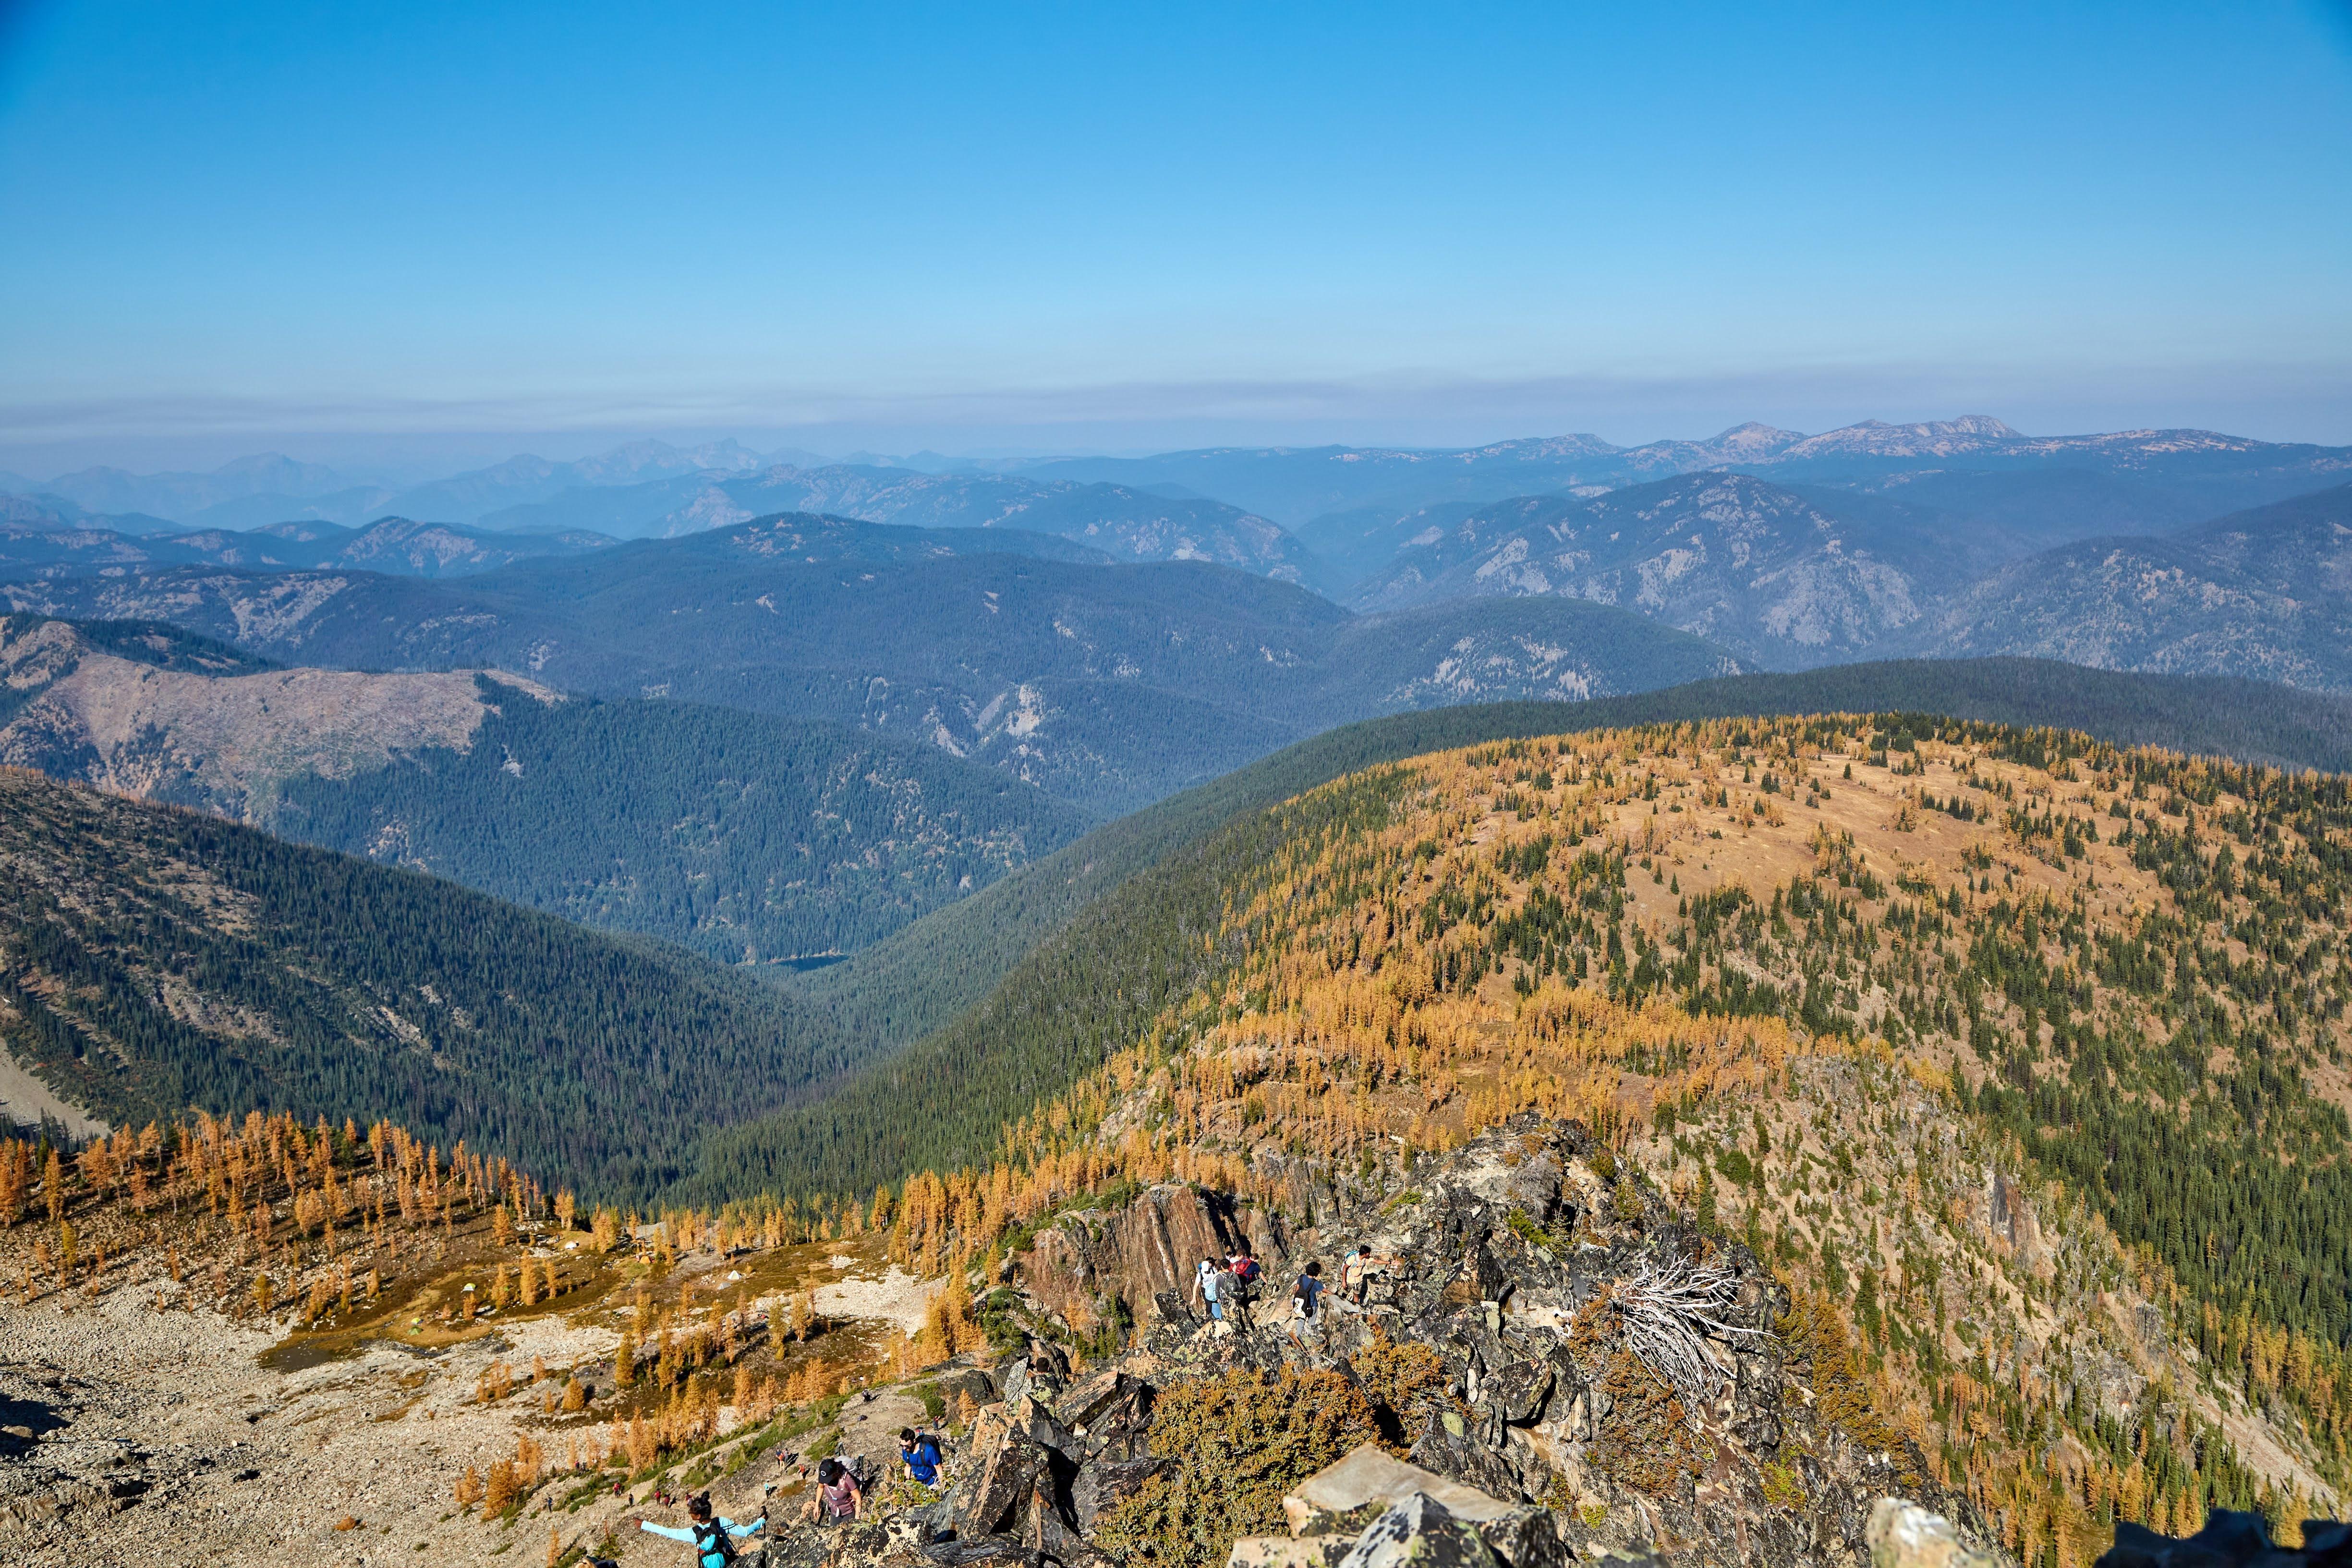 The larches from the ridge. Photo by Radek Kloska.